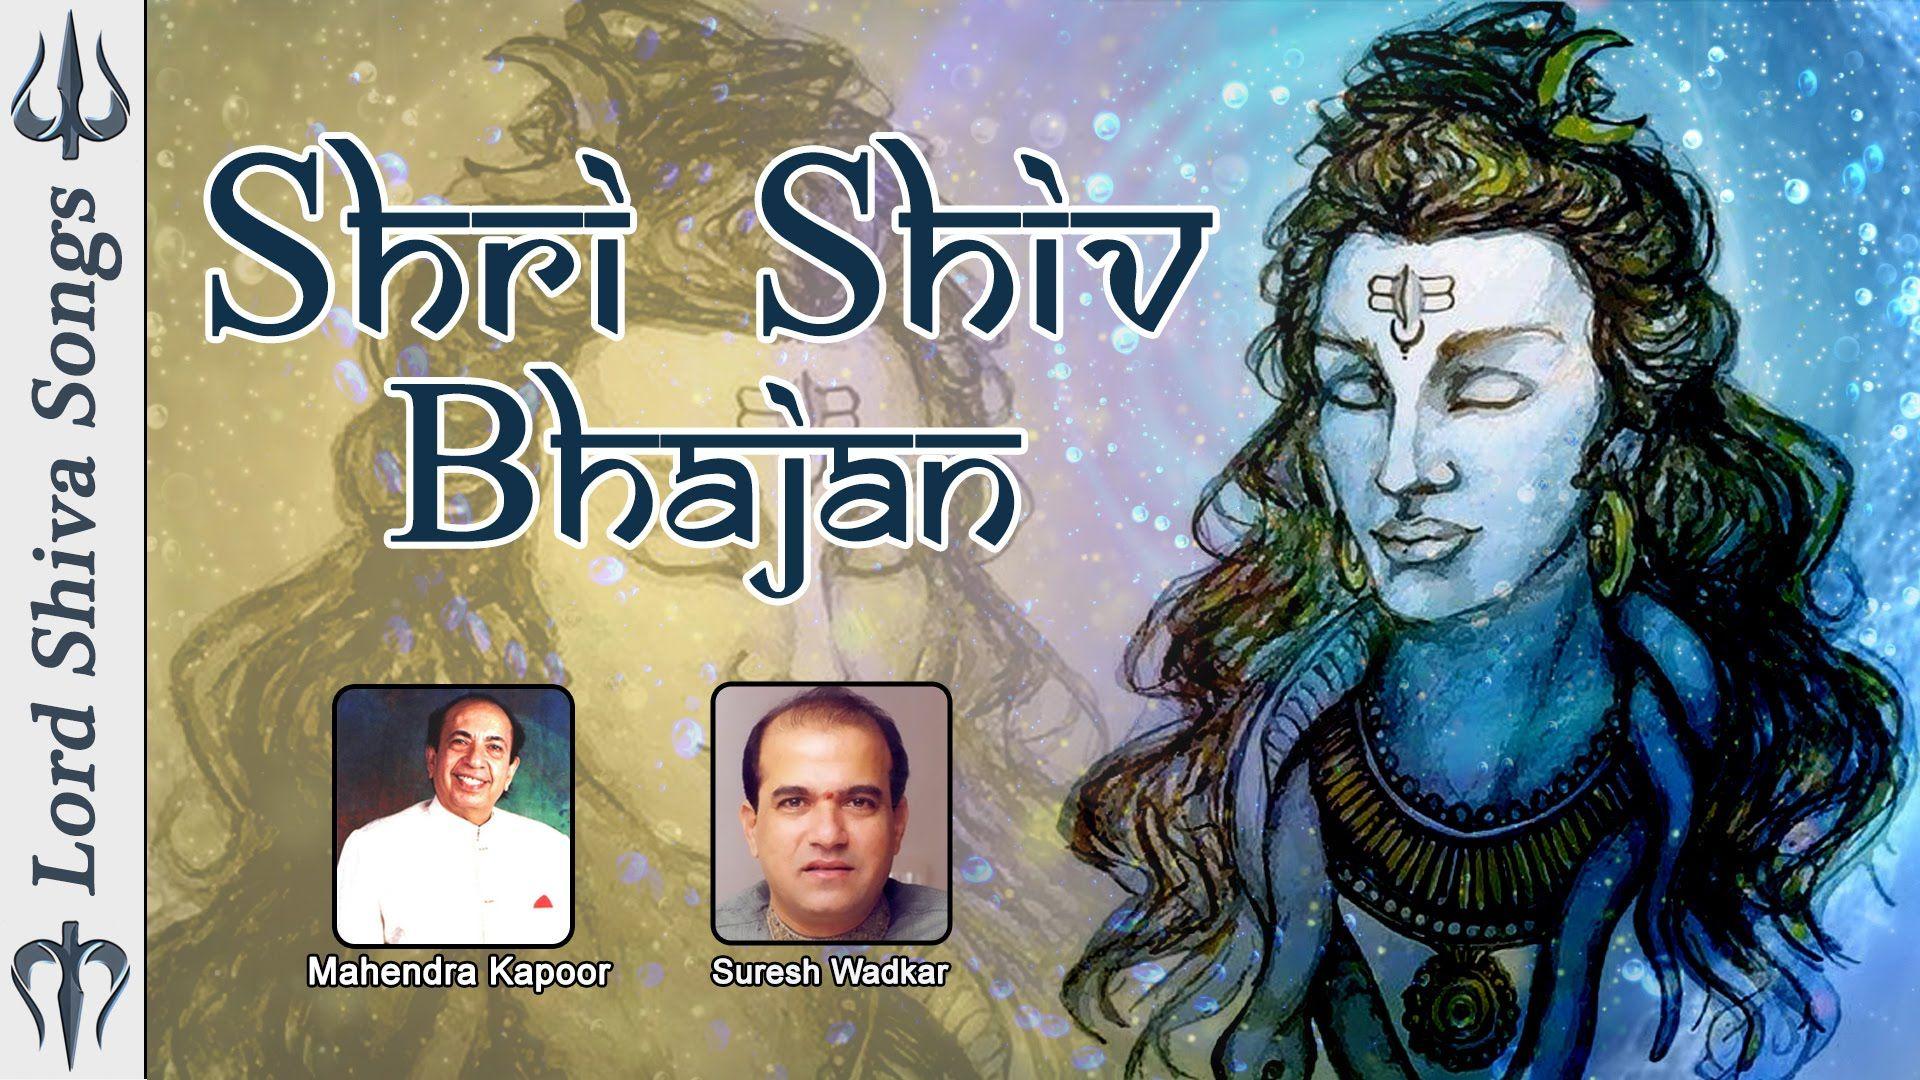 Top Shiva Bhajans Om Nama Shivaya Lord Shiva Songs Devotional Songs Shiva Bhajans Shiva Songs Devotional Songs